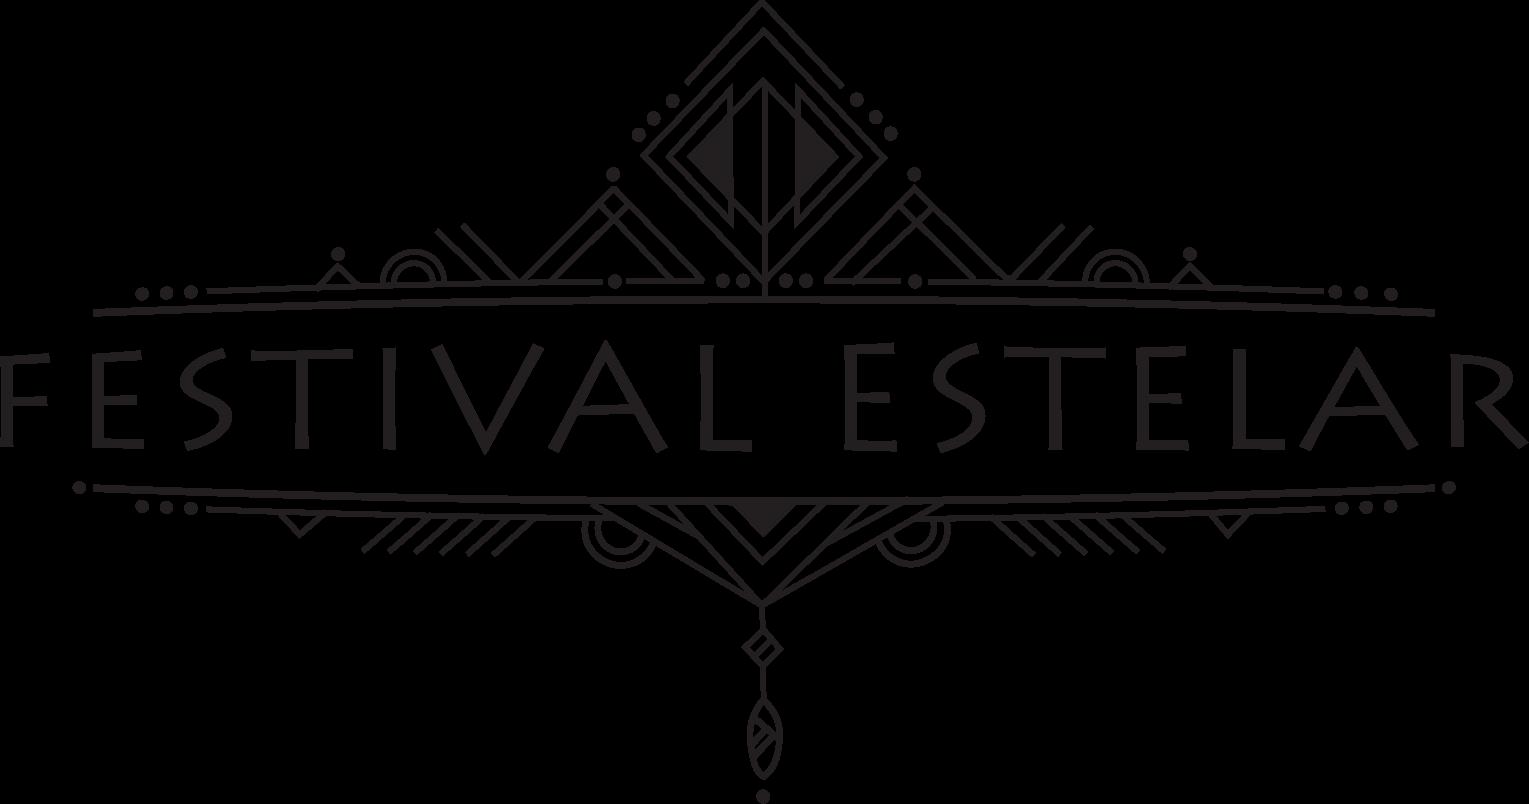 FESTIVAL ESTELAR